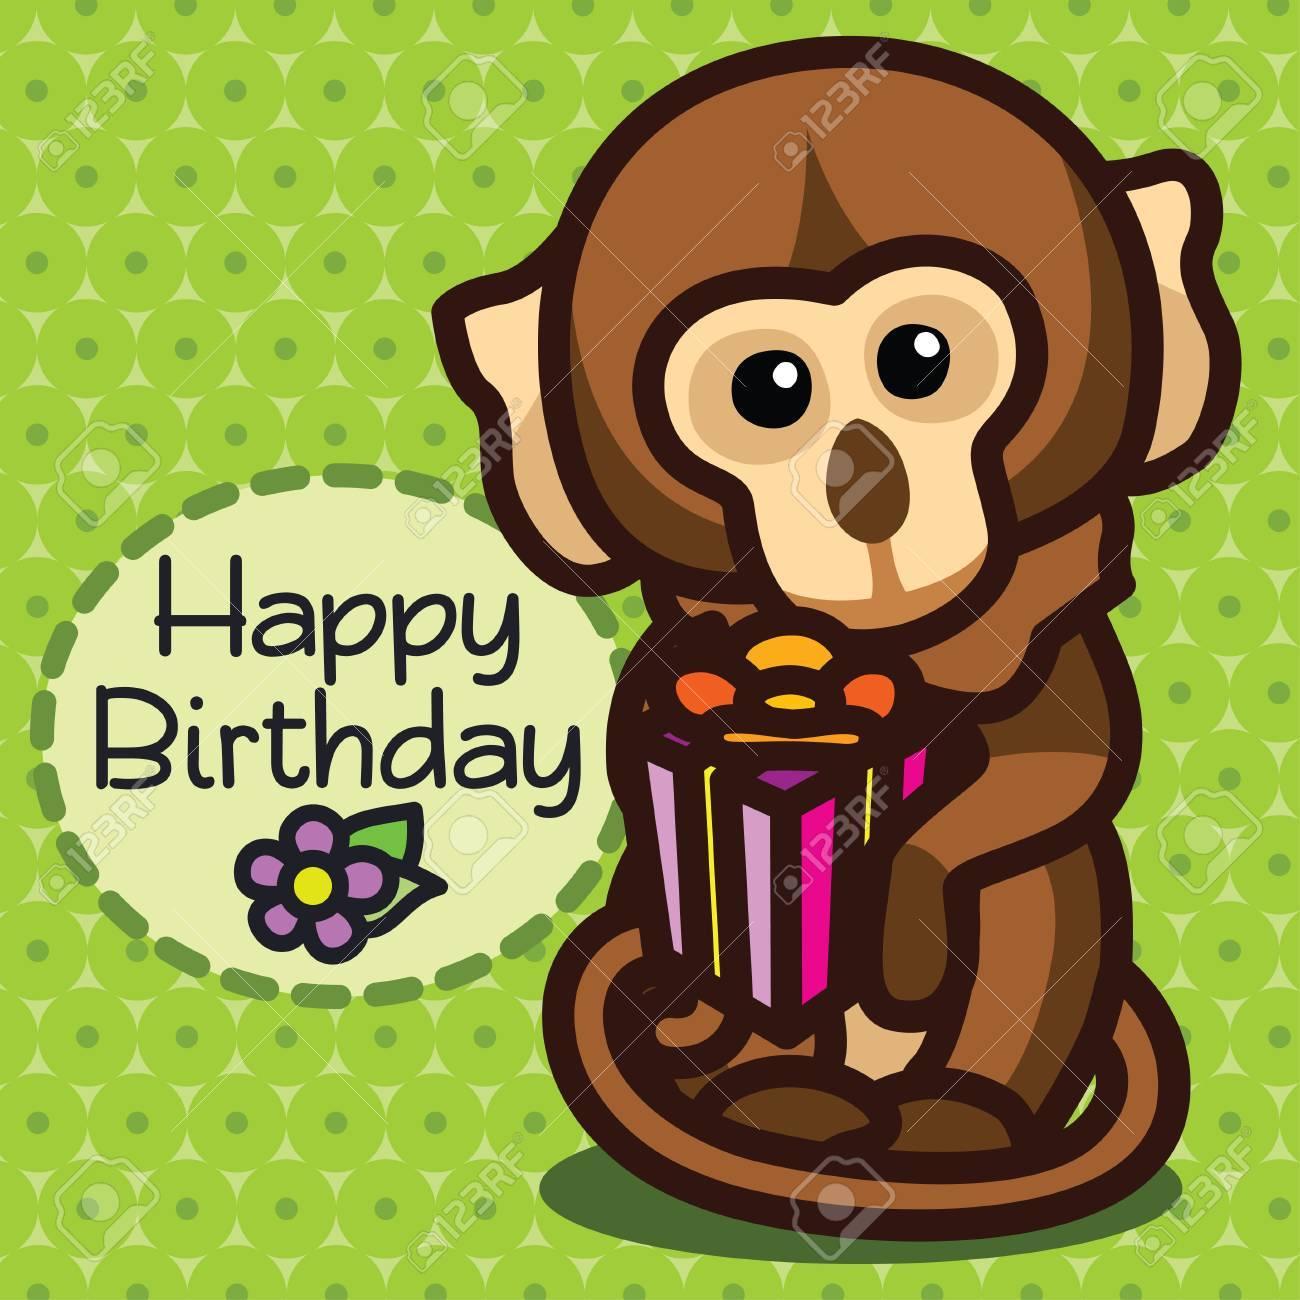 Cute Happy Birthday Card With Fun Monkey Vector Illustration Stock